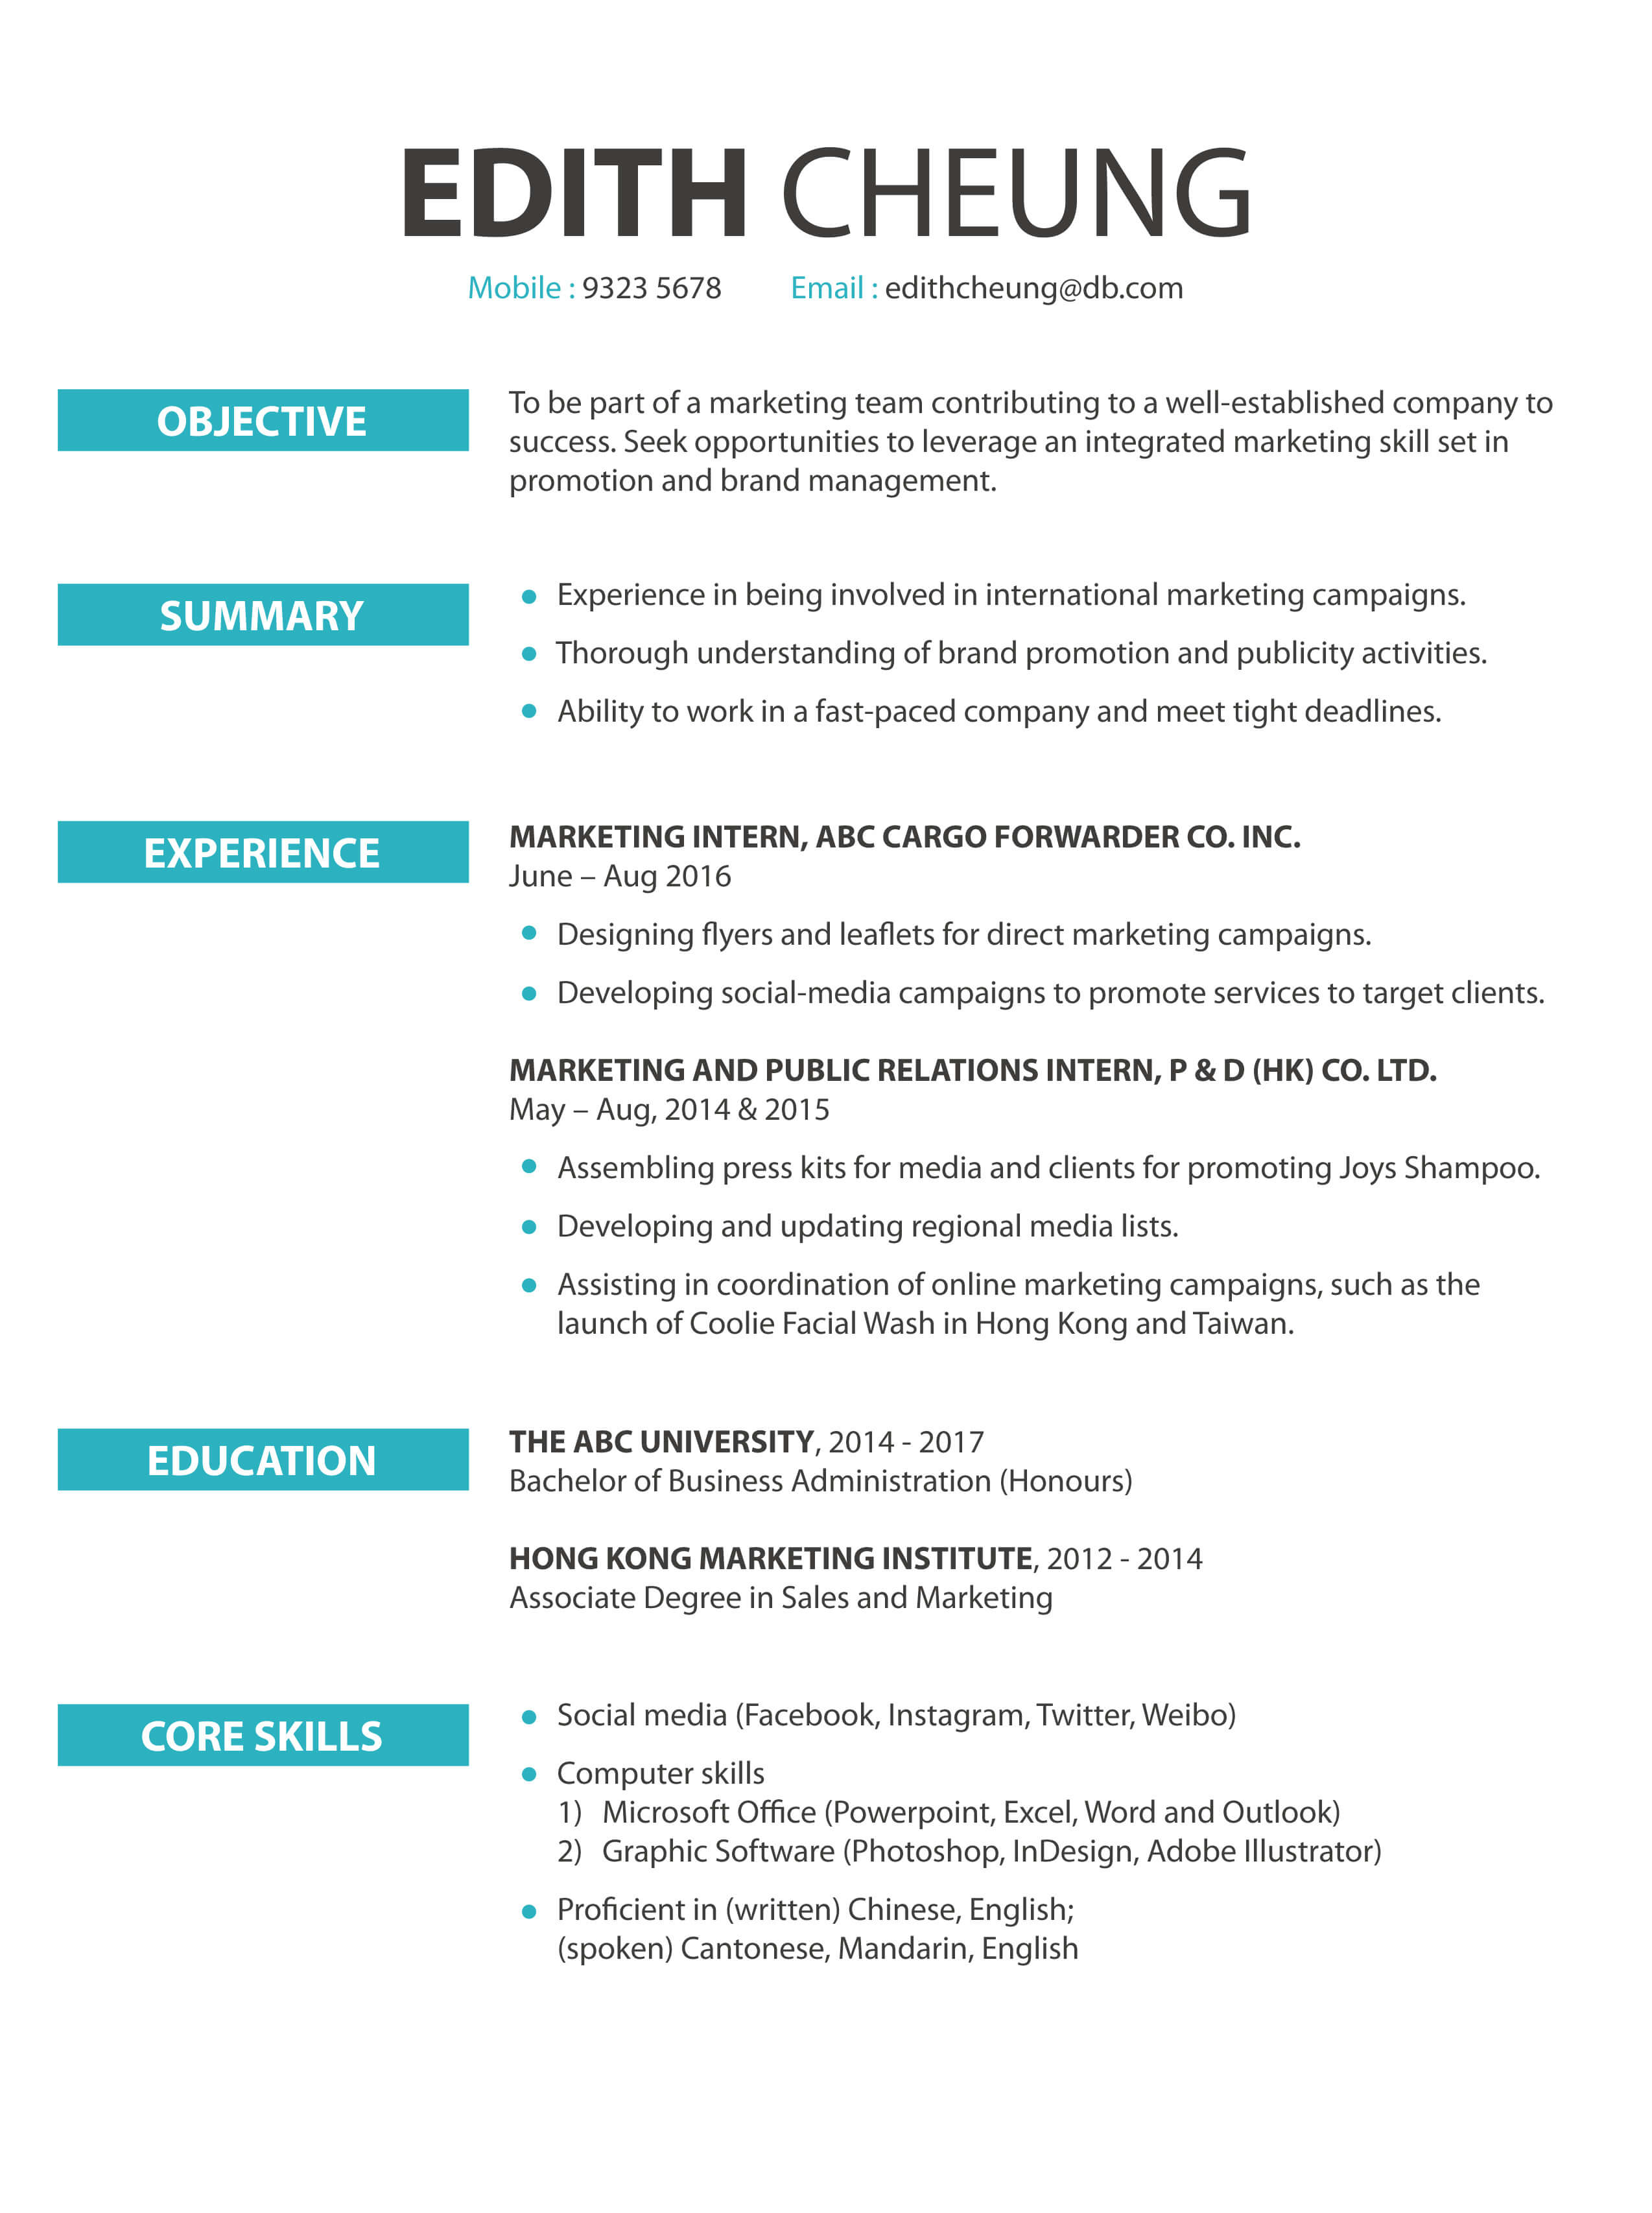 CV cover letter - Marketing / Public Relations